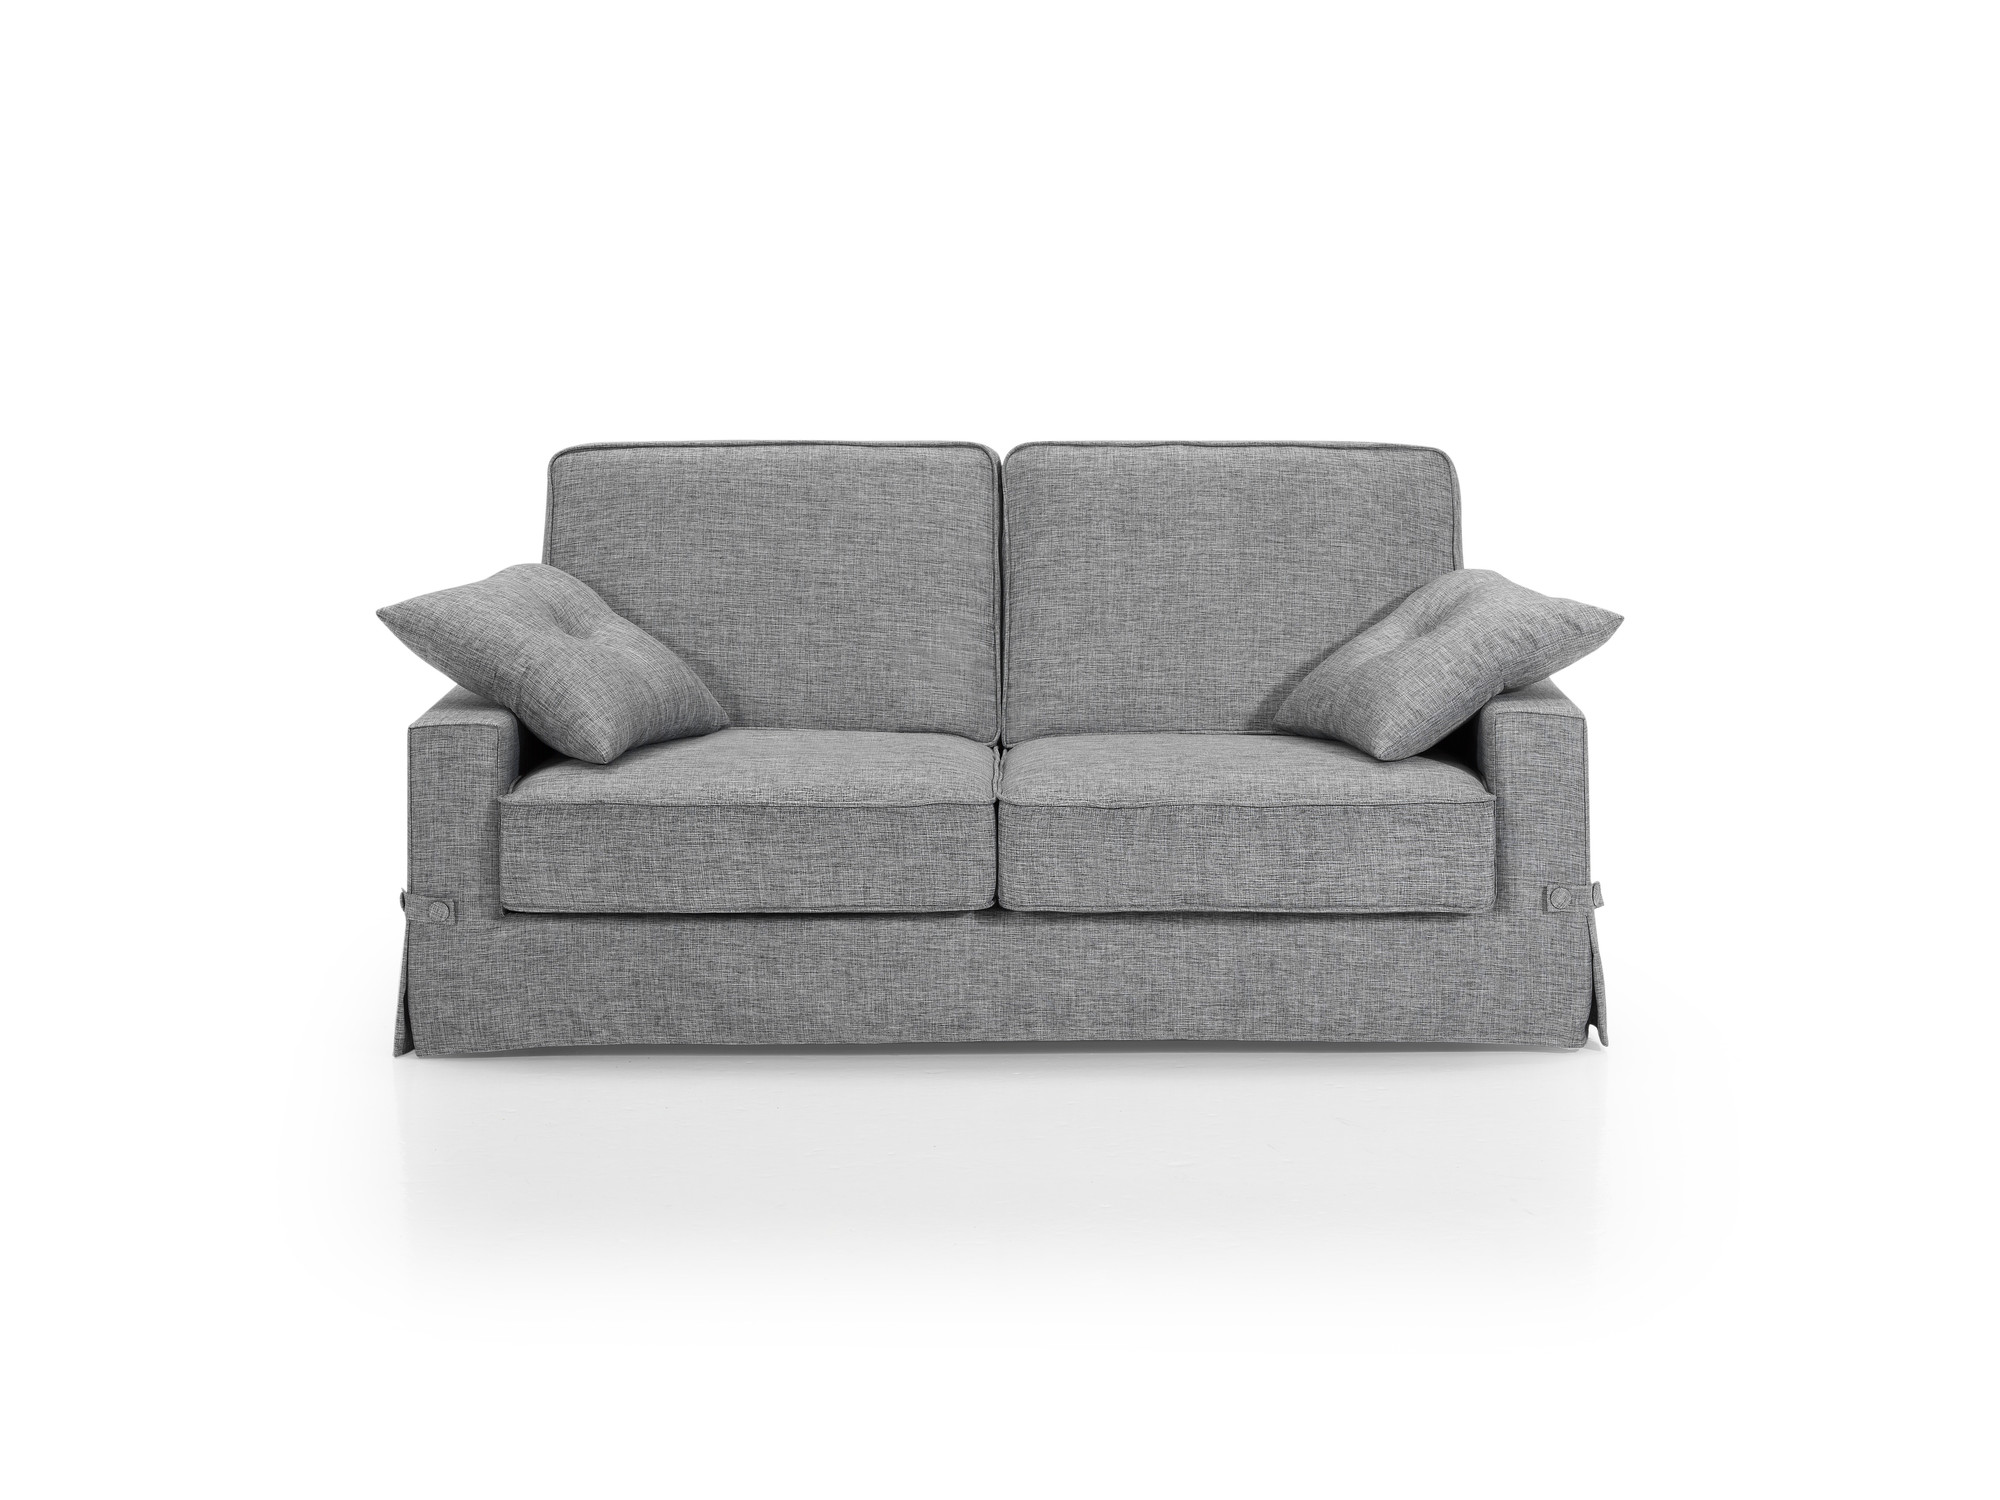 Sofas online baratos que se adaptan a cualquier decoraci n for Sofas baratos on line